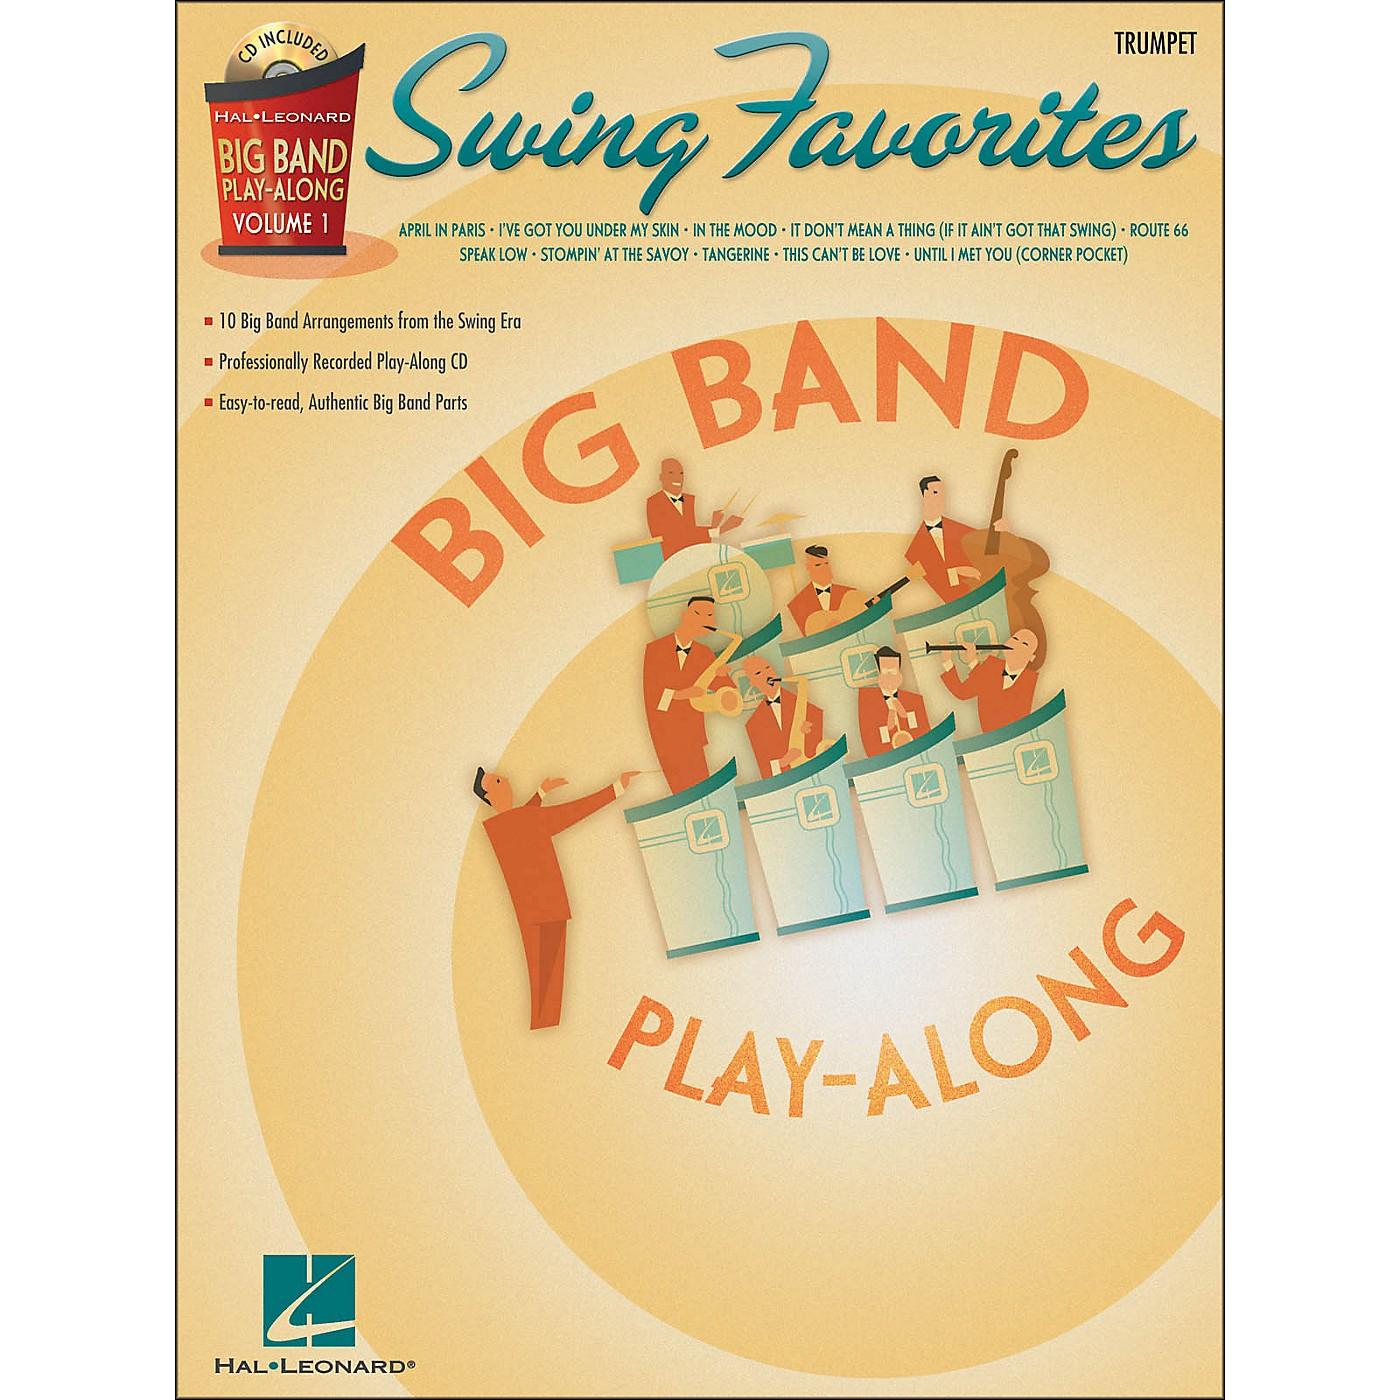 Hal Leonard Swing Favorites Big Band Play-Along Vol. 1 Trumpet Book/CD thumbnail